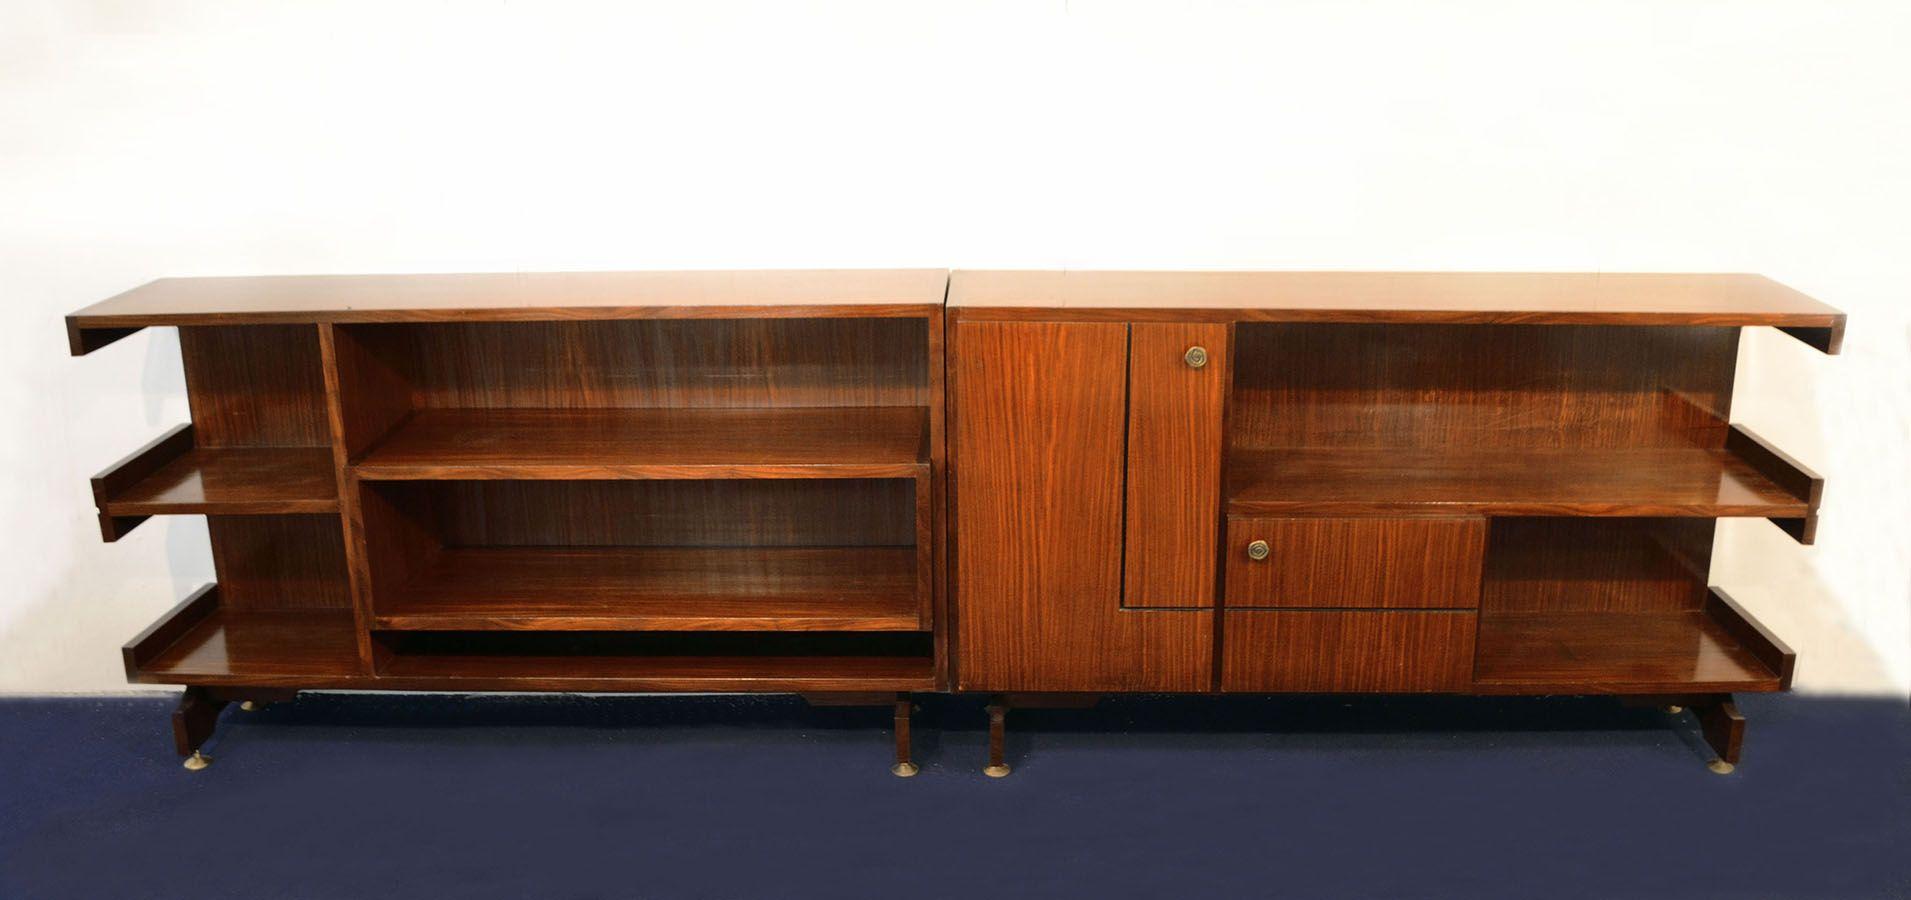 Modulare Sideboards mit Palisander-Furnier und Messing, 1960er, 2er Se...